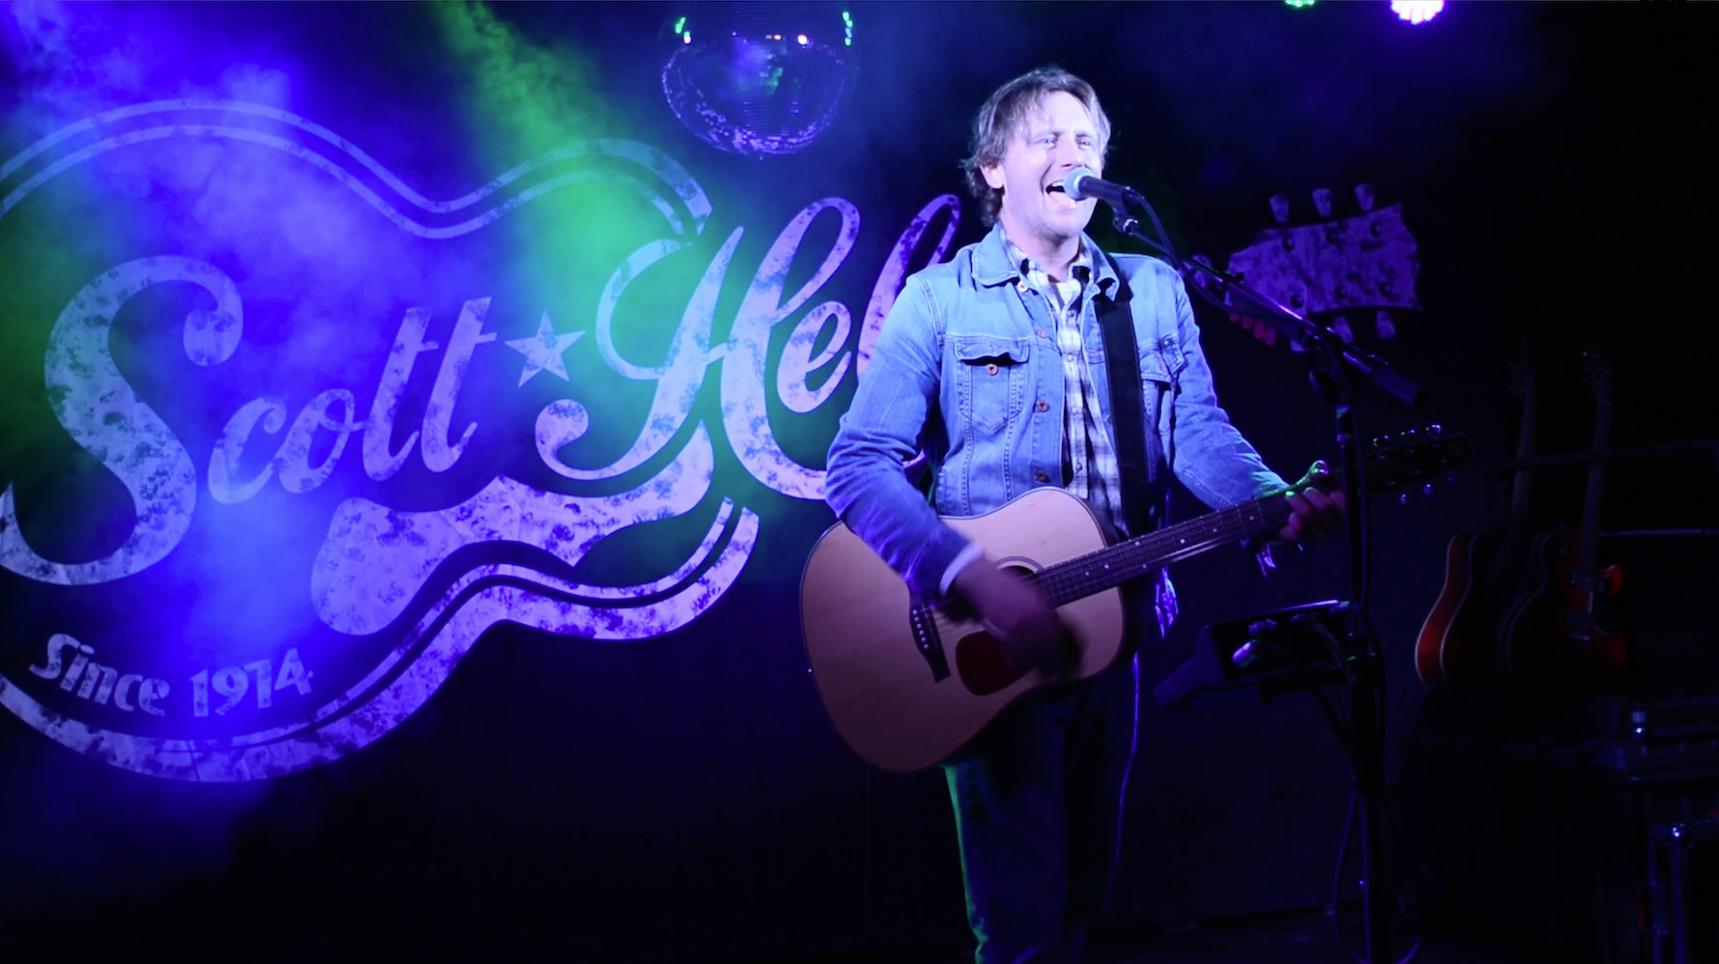 Scott Helmer live on stage.